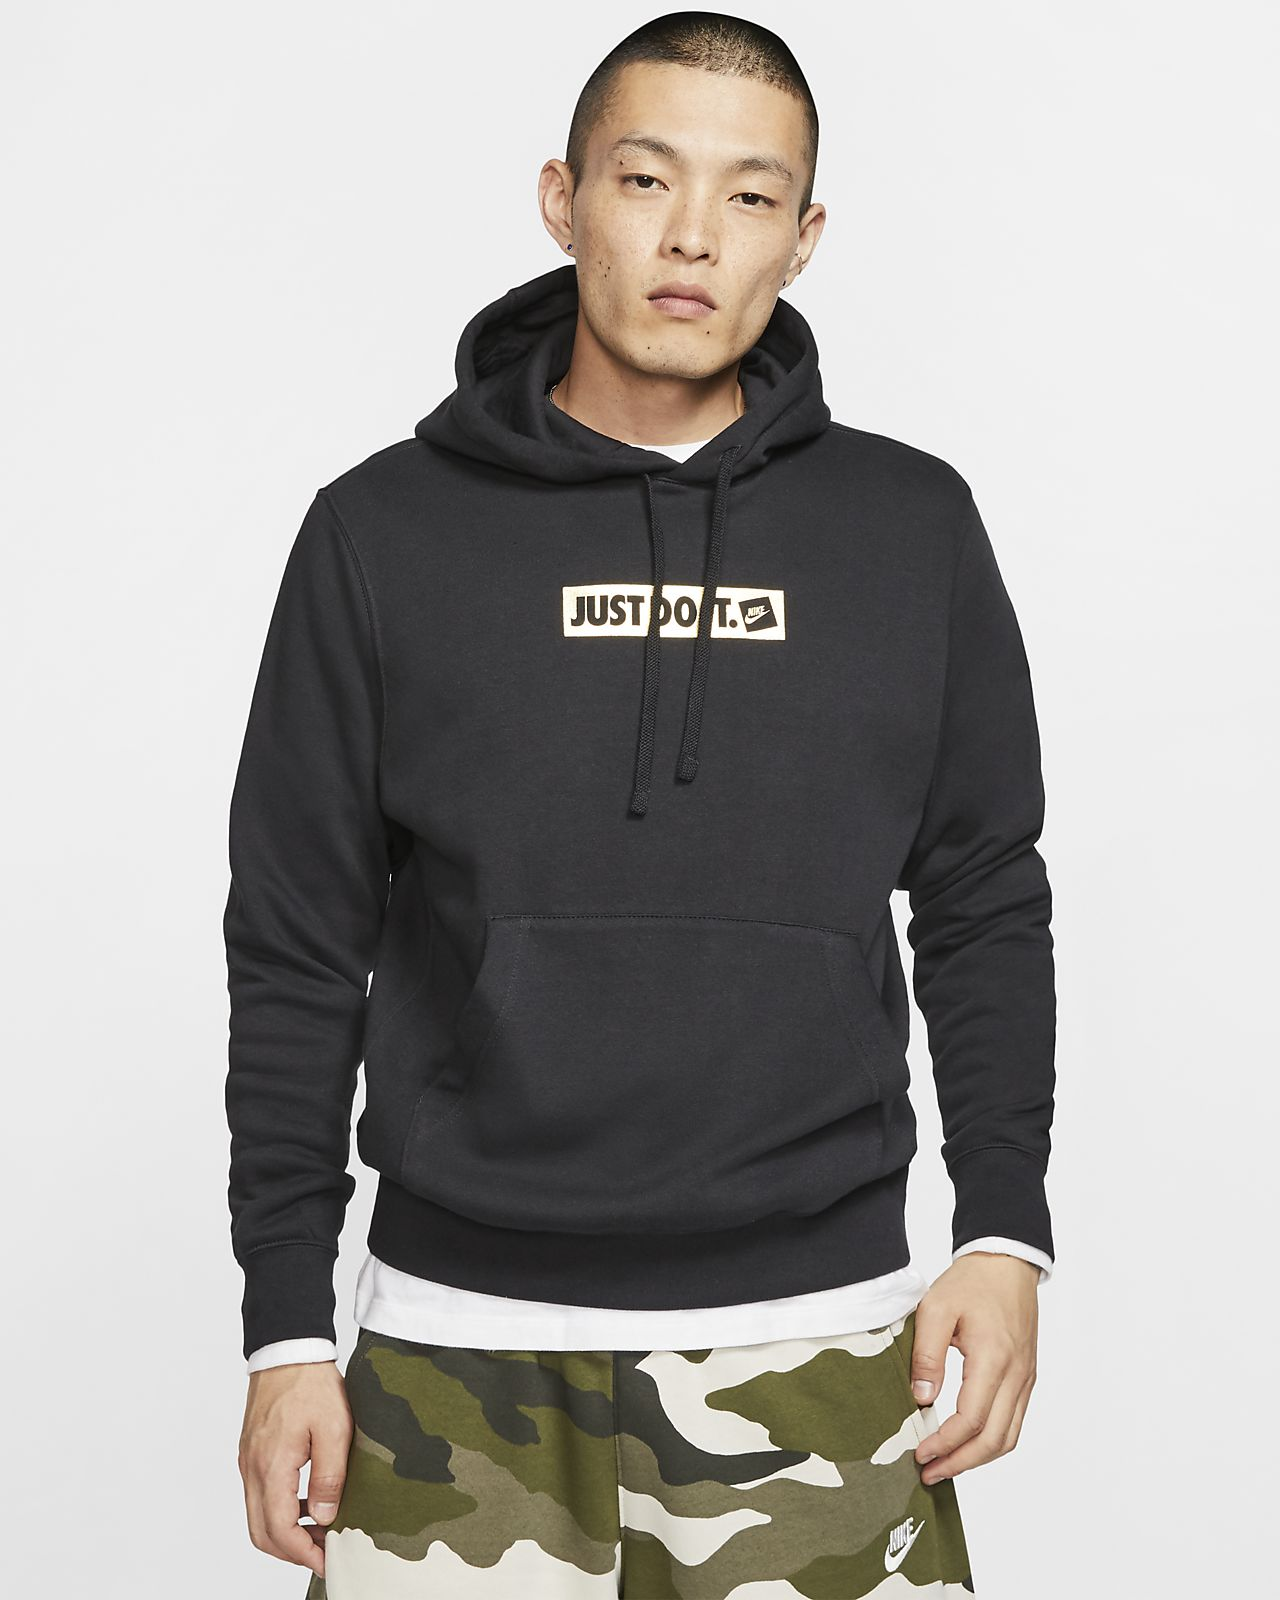 nike hoodie quality